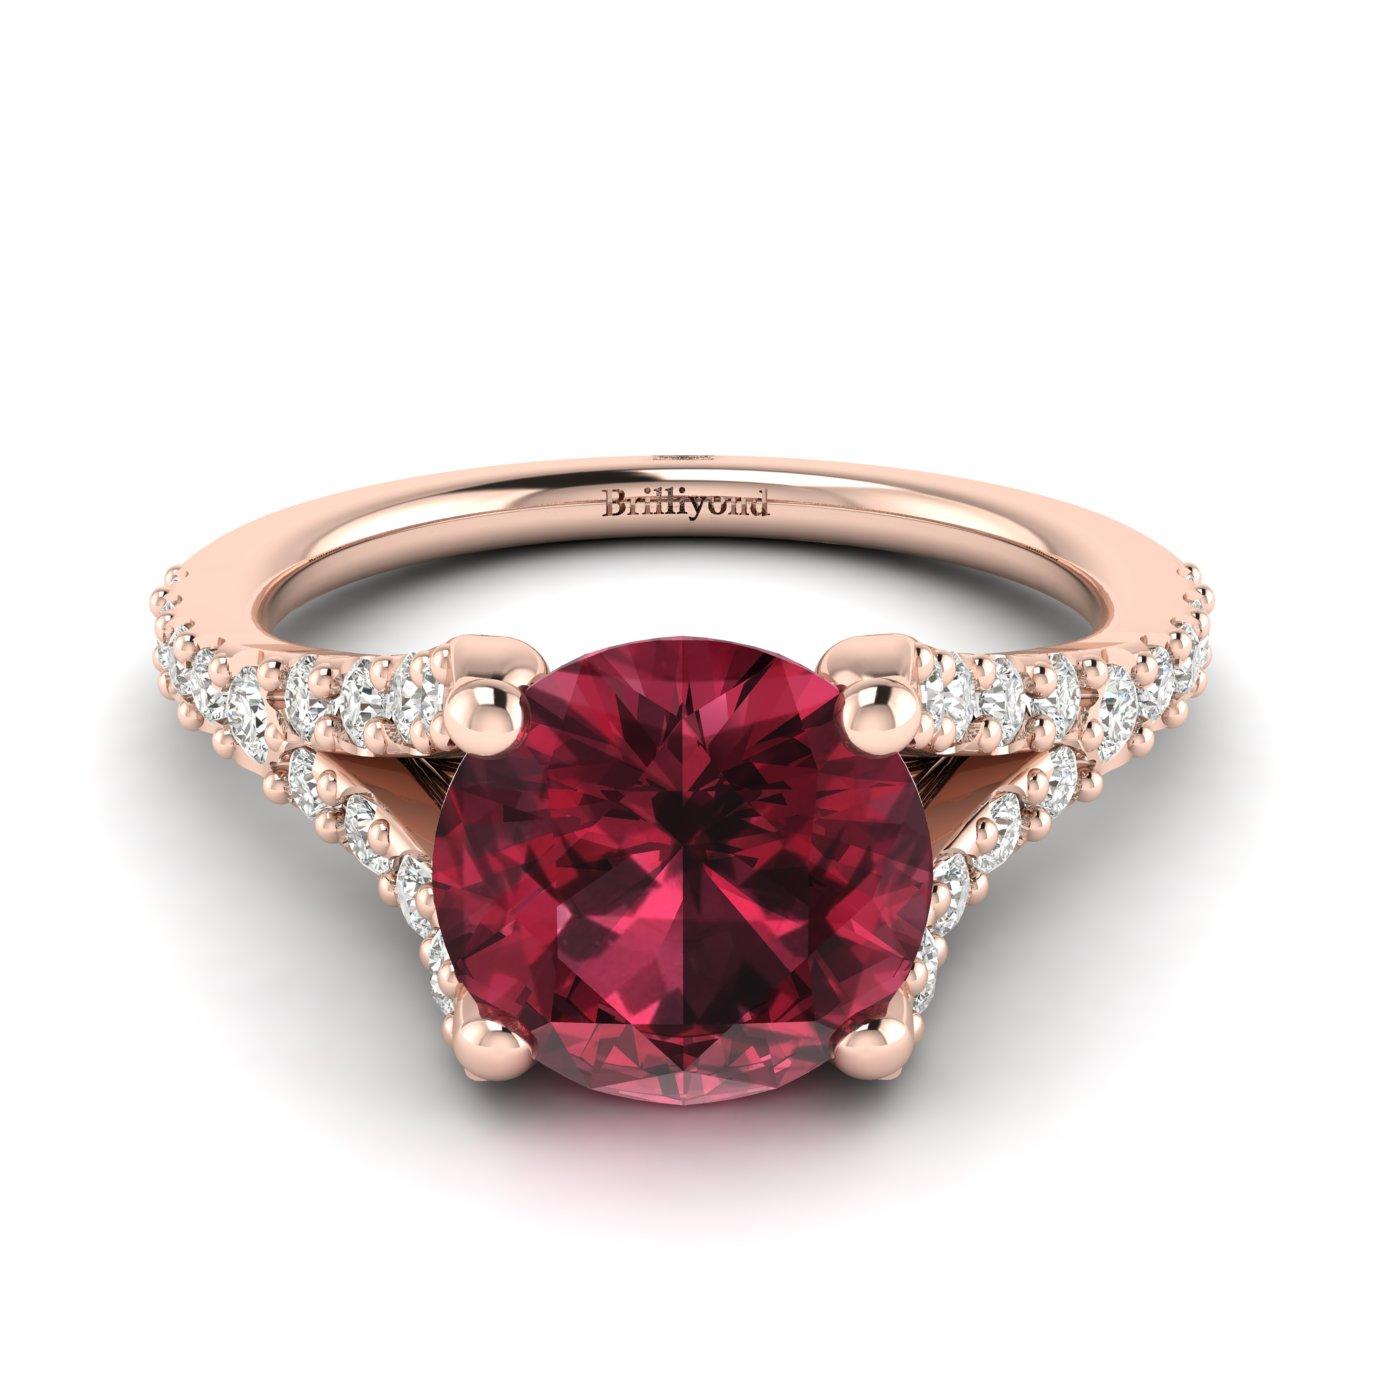 A unique Juliana engagement ring featuring a pavé split shank setting.